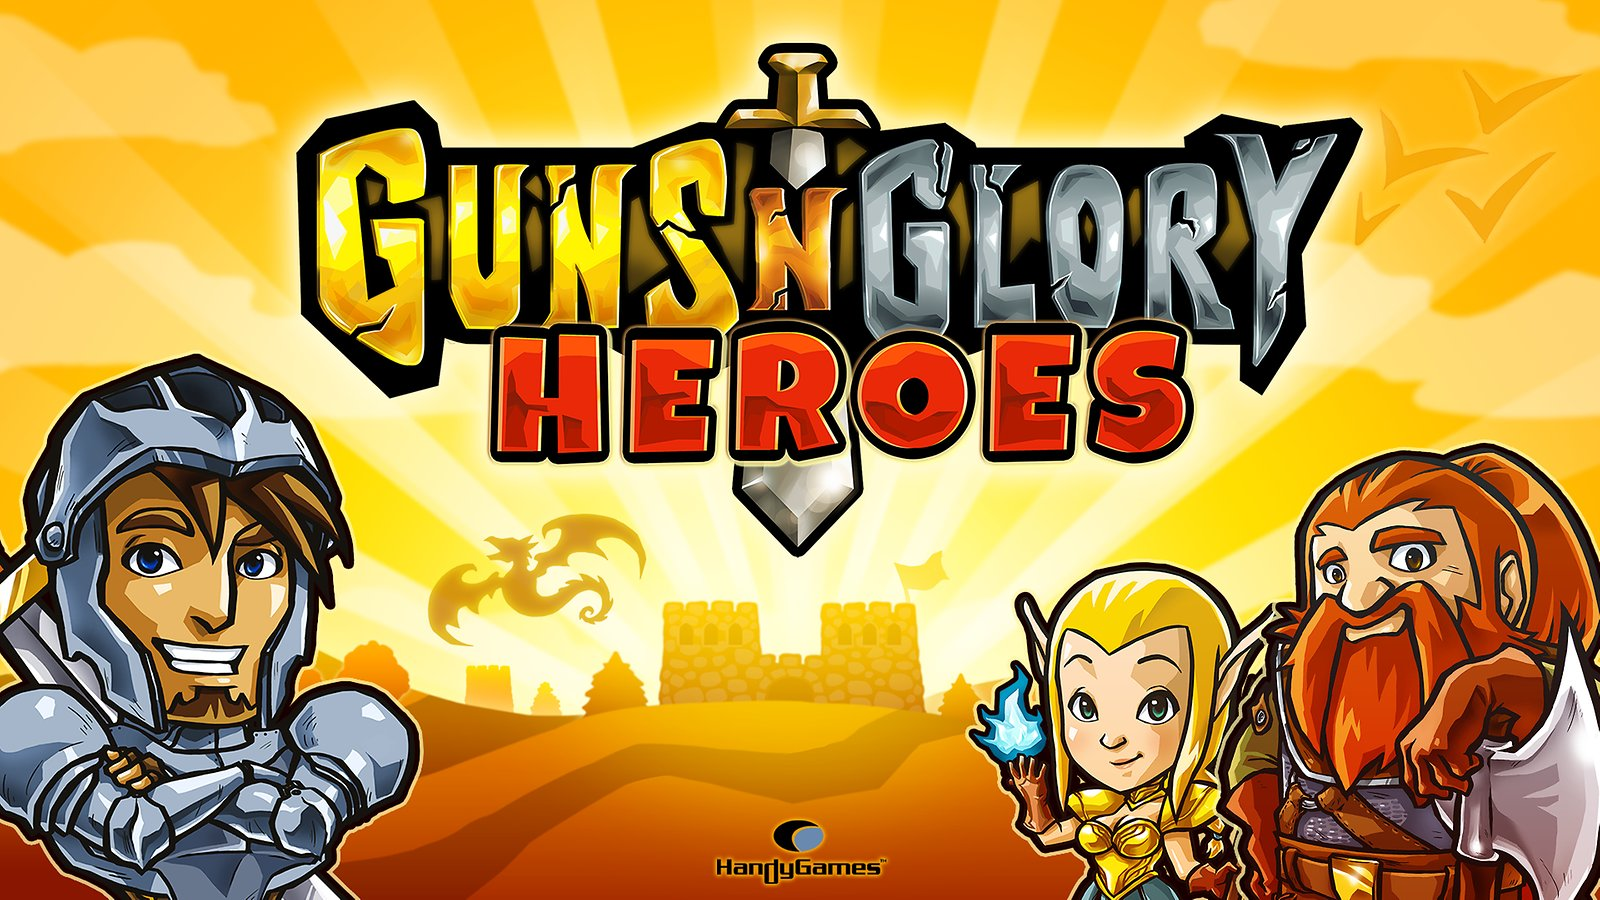 Guns'n'Glory Heroes Premium APK Normal + Mod (dinero ilimitado)